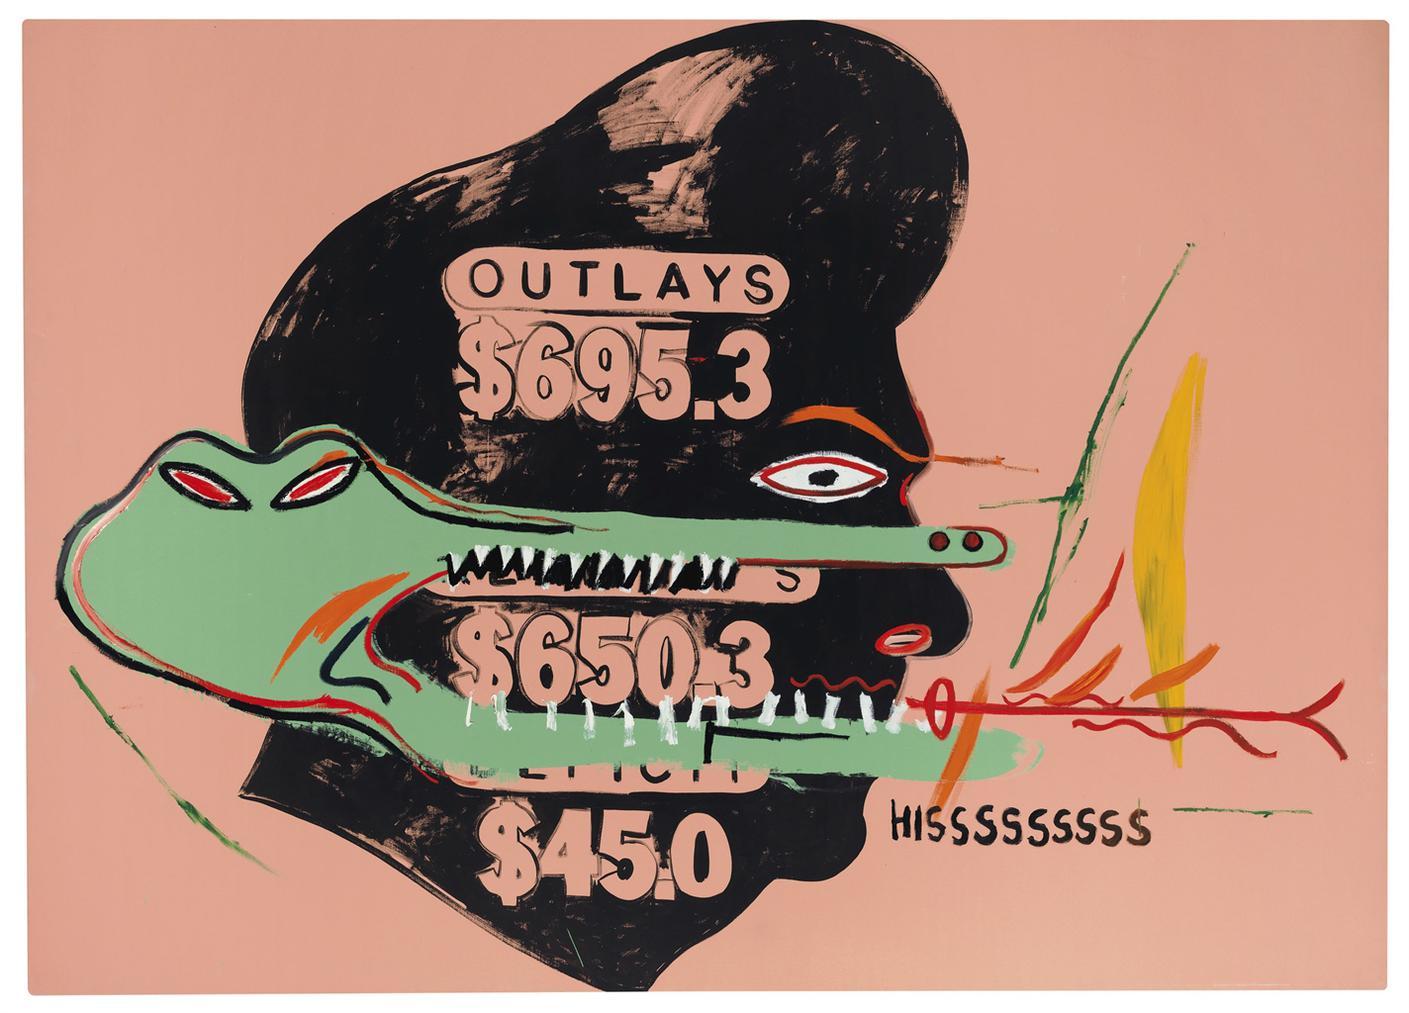 Andy Warhol & Jean-Michel Basquiat - Outlays Hisssssssss (Collaboration #22)-1985